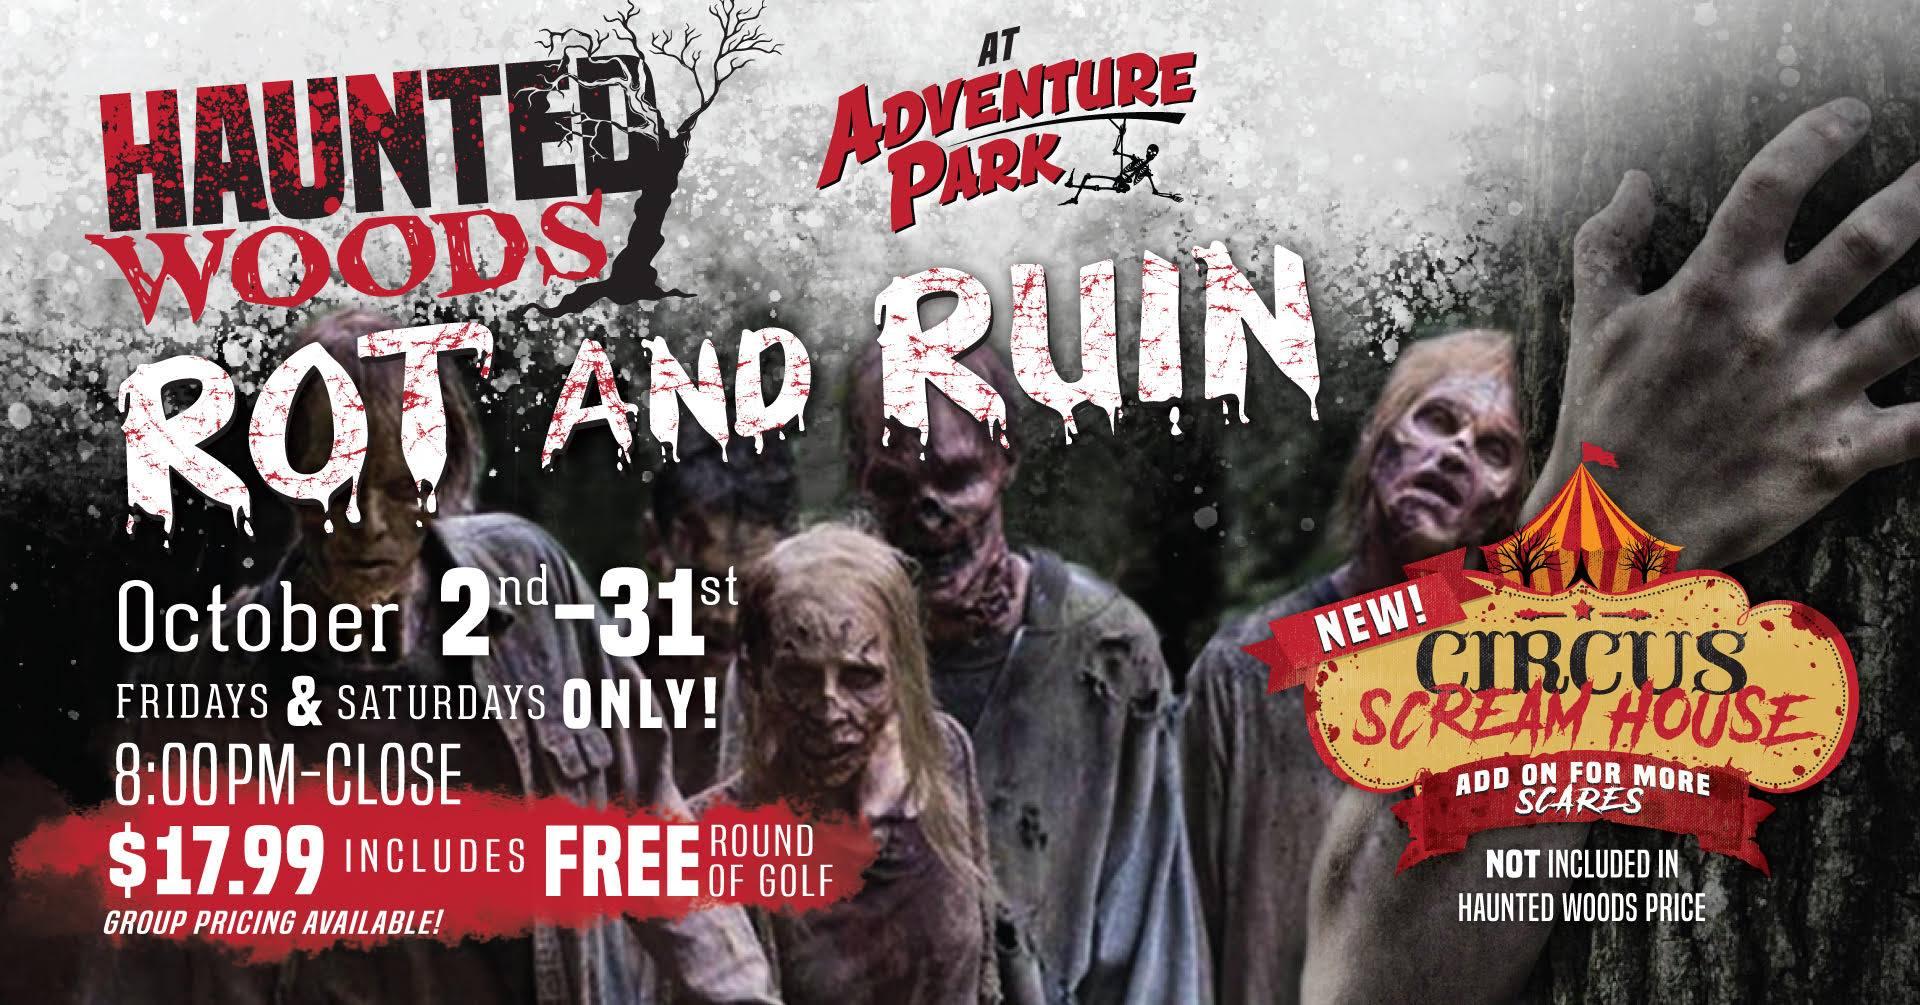 Haunted Woods. Buy tickets now